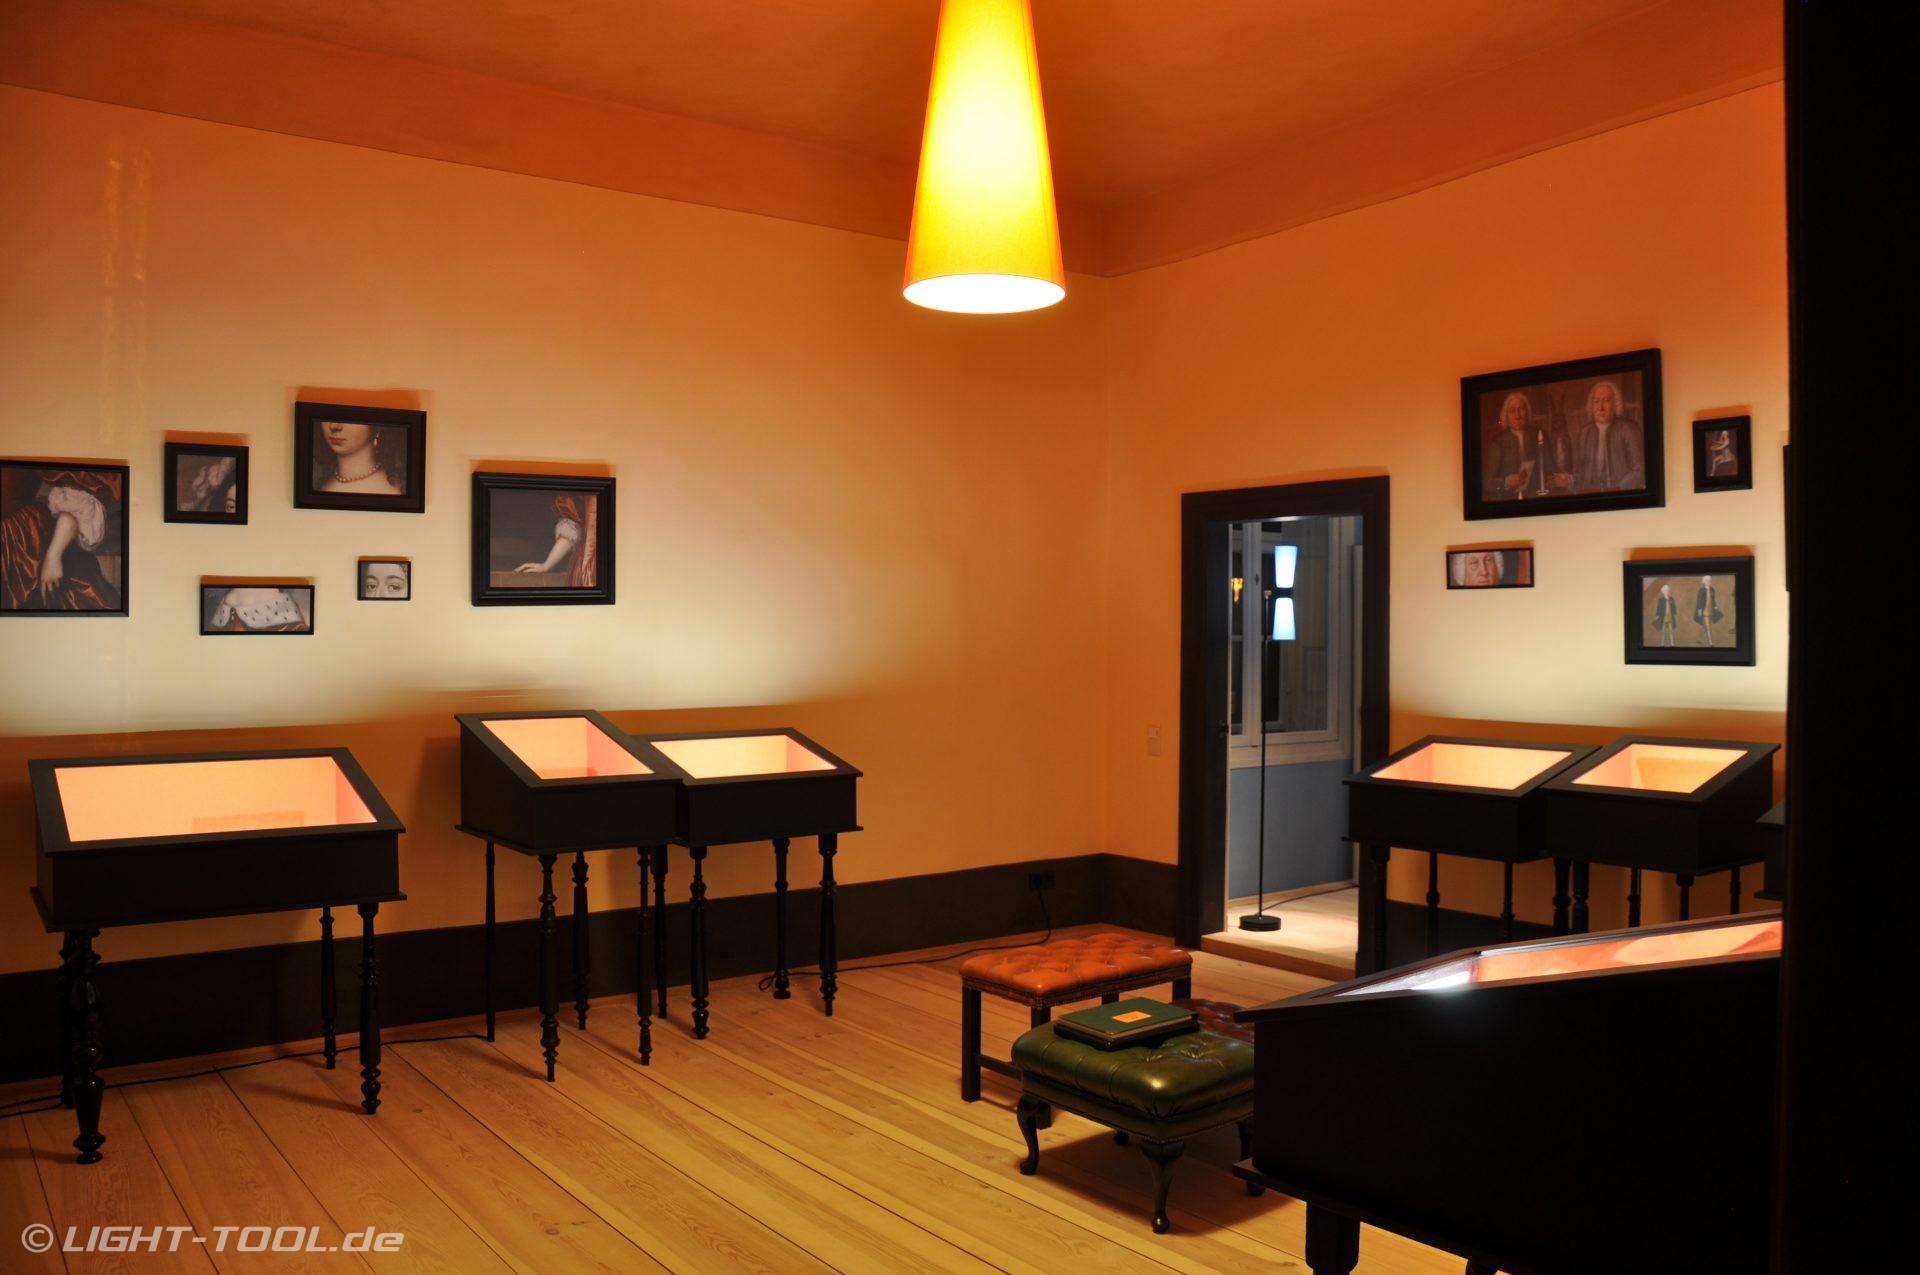 led ausstellungs vitrinenbeleuchtung im schloss oranienbaum in w rlitz light tool. Black Bedroom Furniture Sets. Home Design Ideas